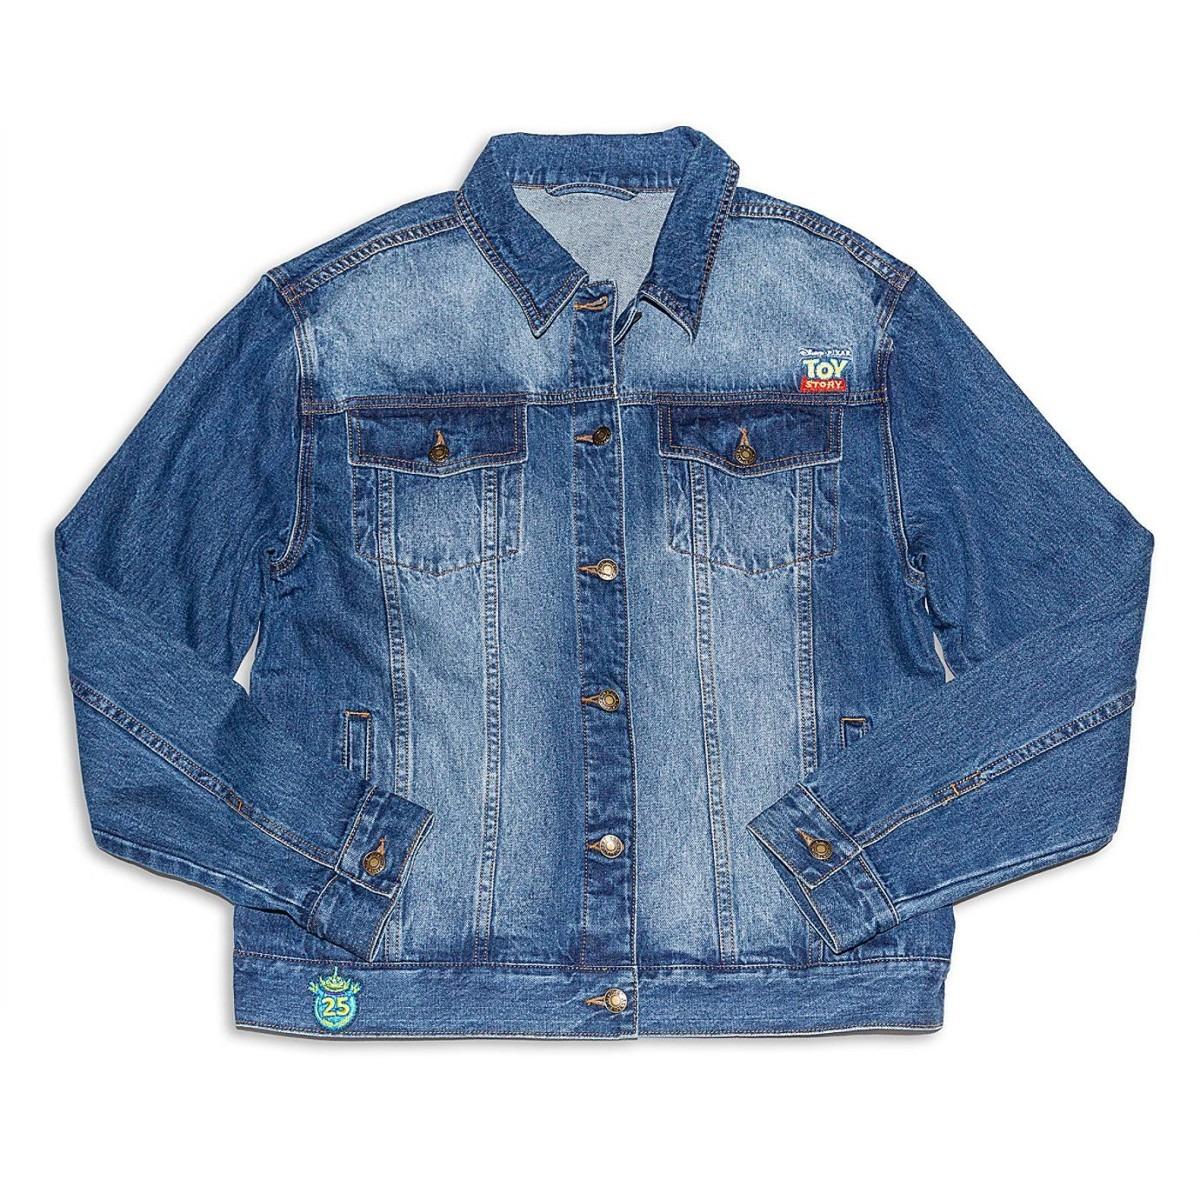 Toy Story Jacket